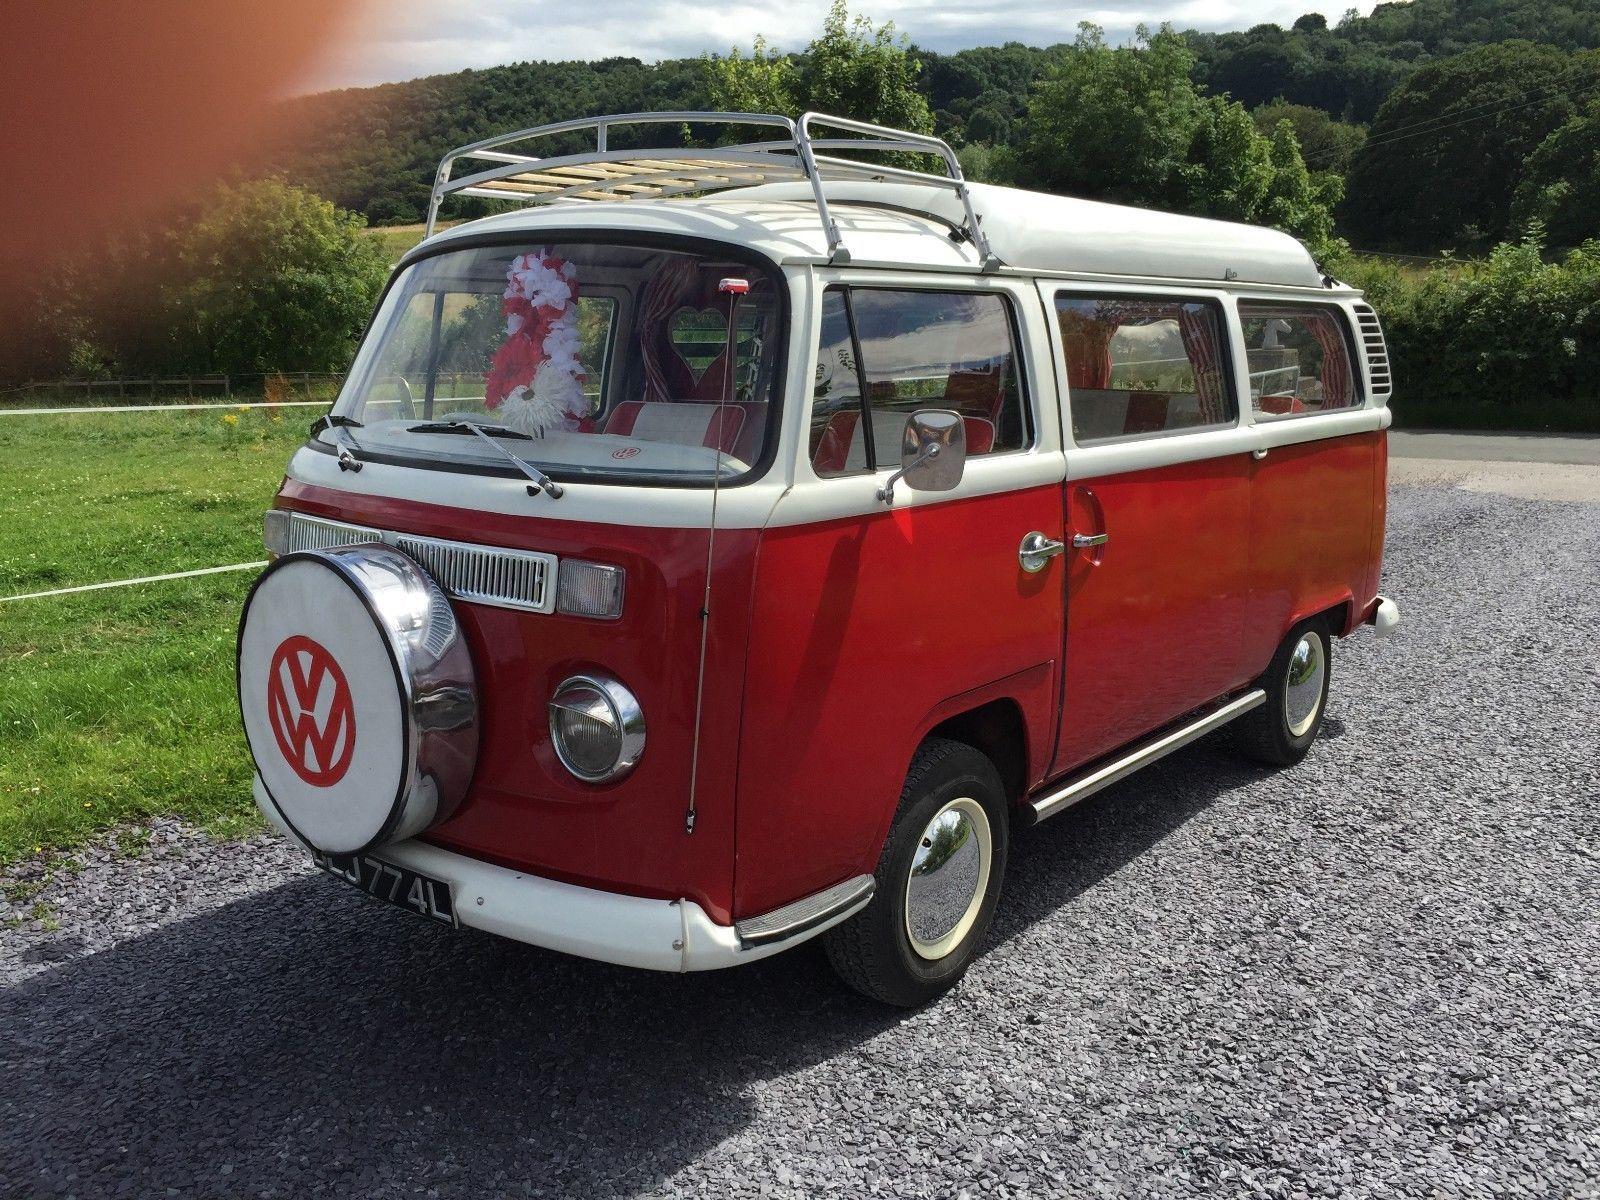 EBay: Campervan INTERIOR Conversion Into YOUR OWN VW T2 BAY CAMPER VAN  SPLIT SCREEN #